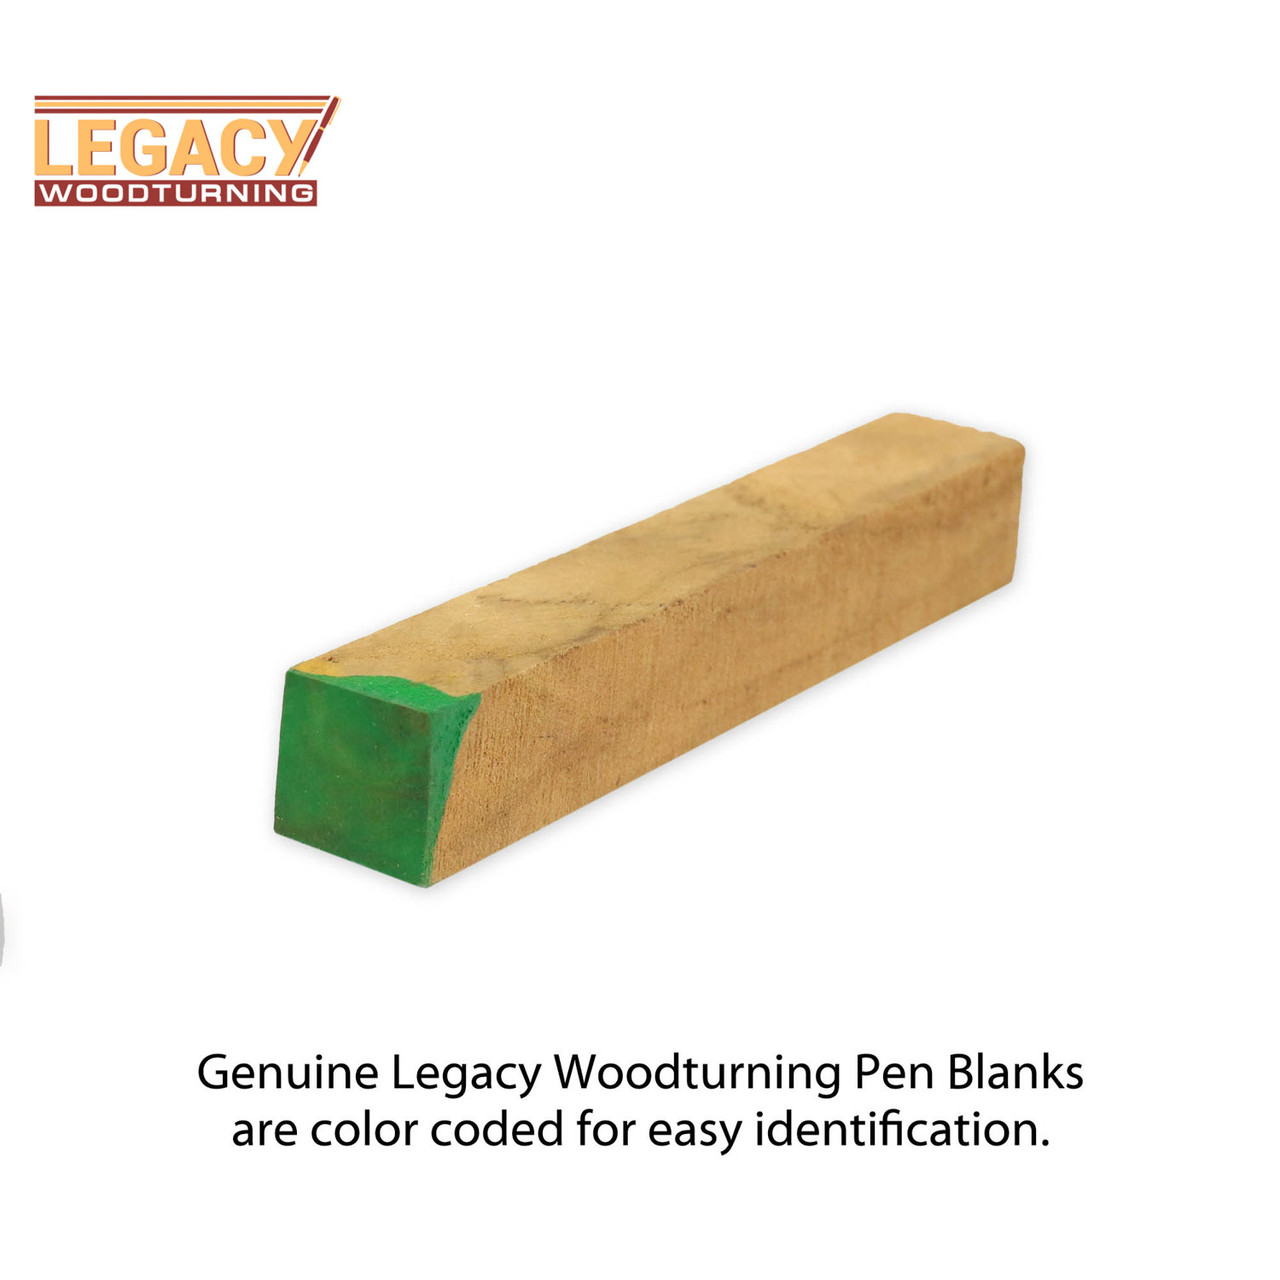 "Legacy Highly Figured Teak Wood Pen Blank, 3/4"" x 3/4"" x 5"""